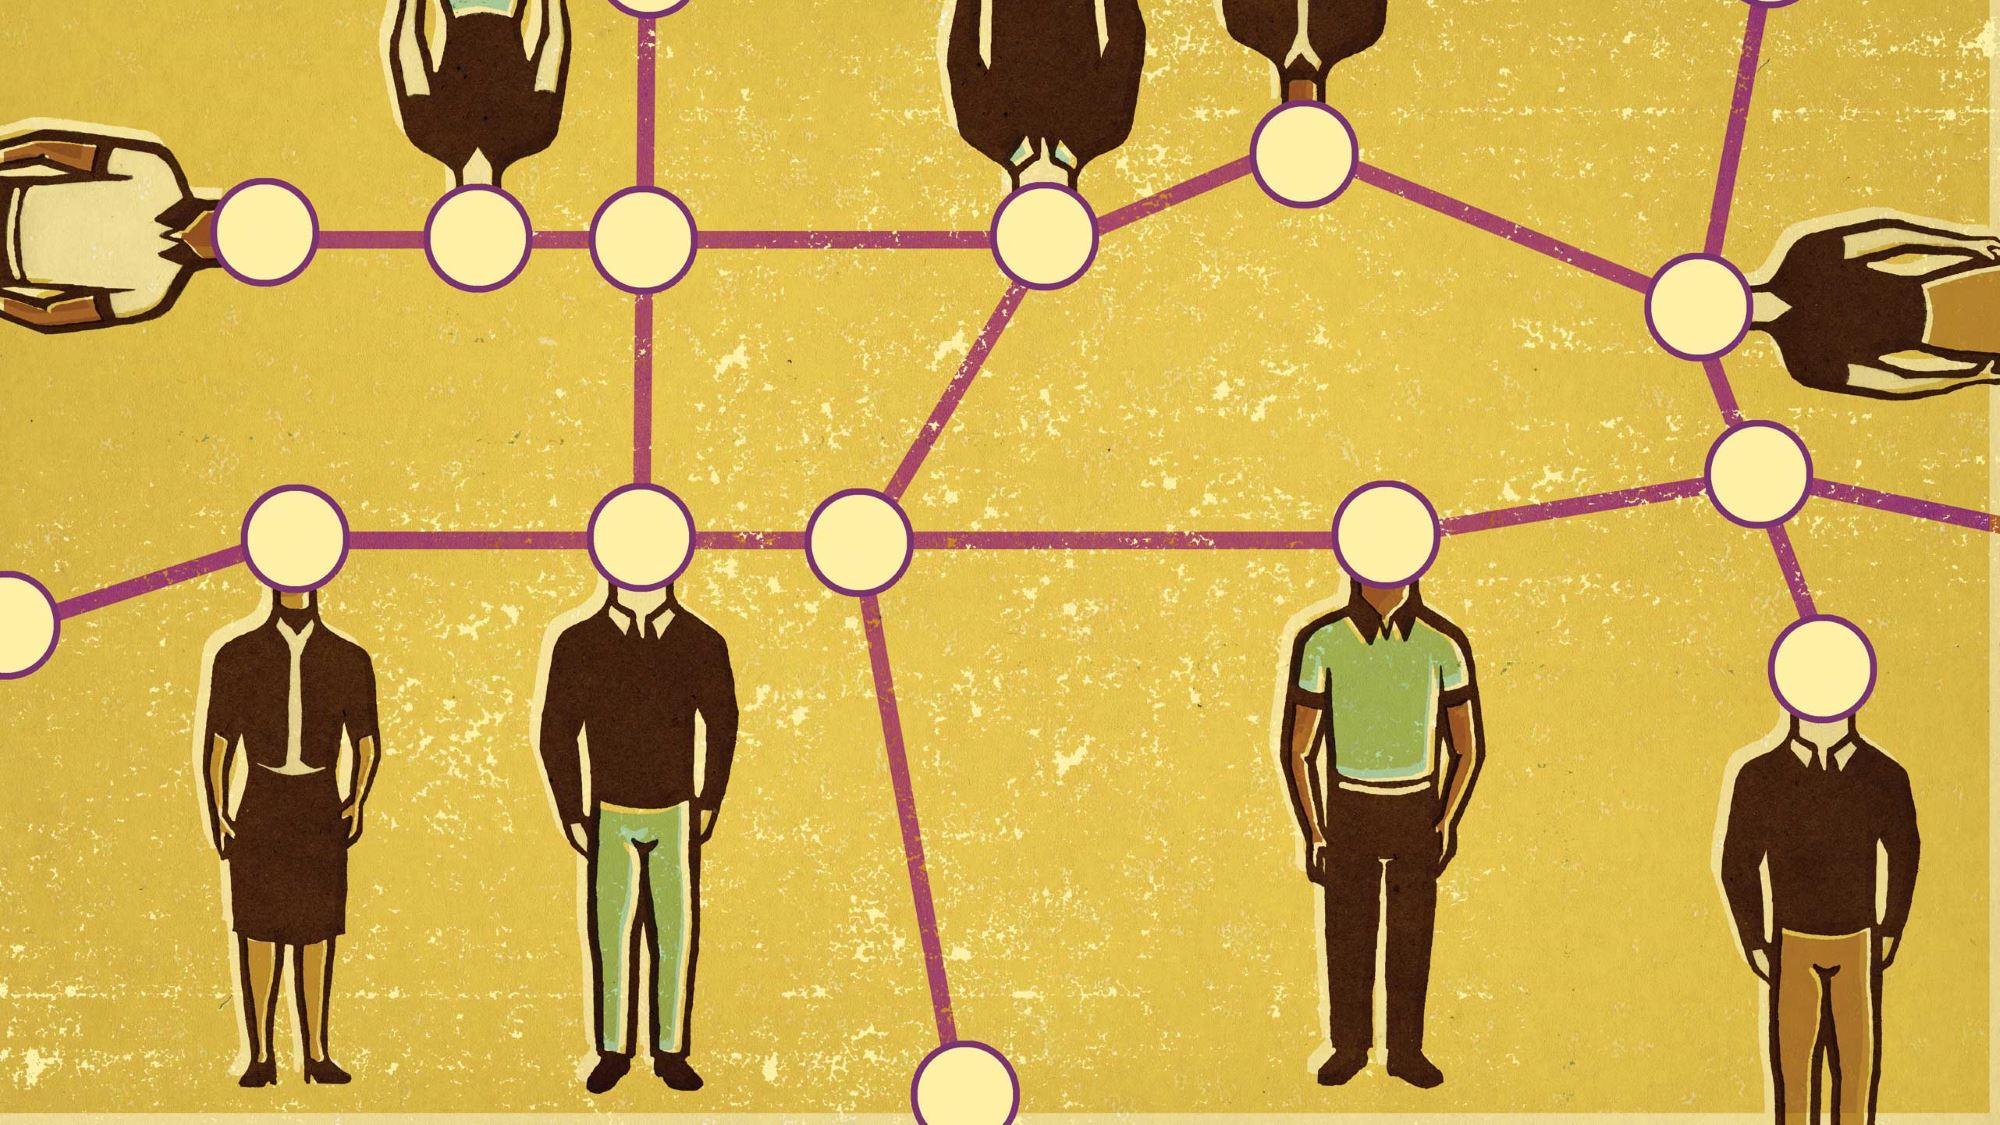 Crowdsourcing: Kalabalığın Gücü